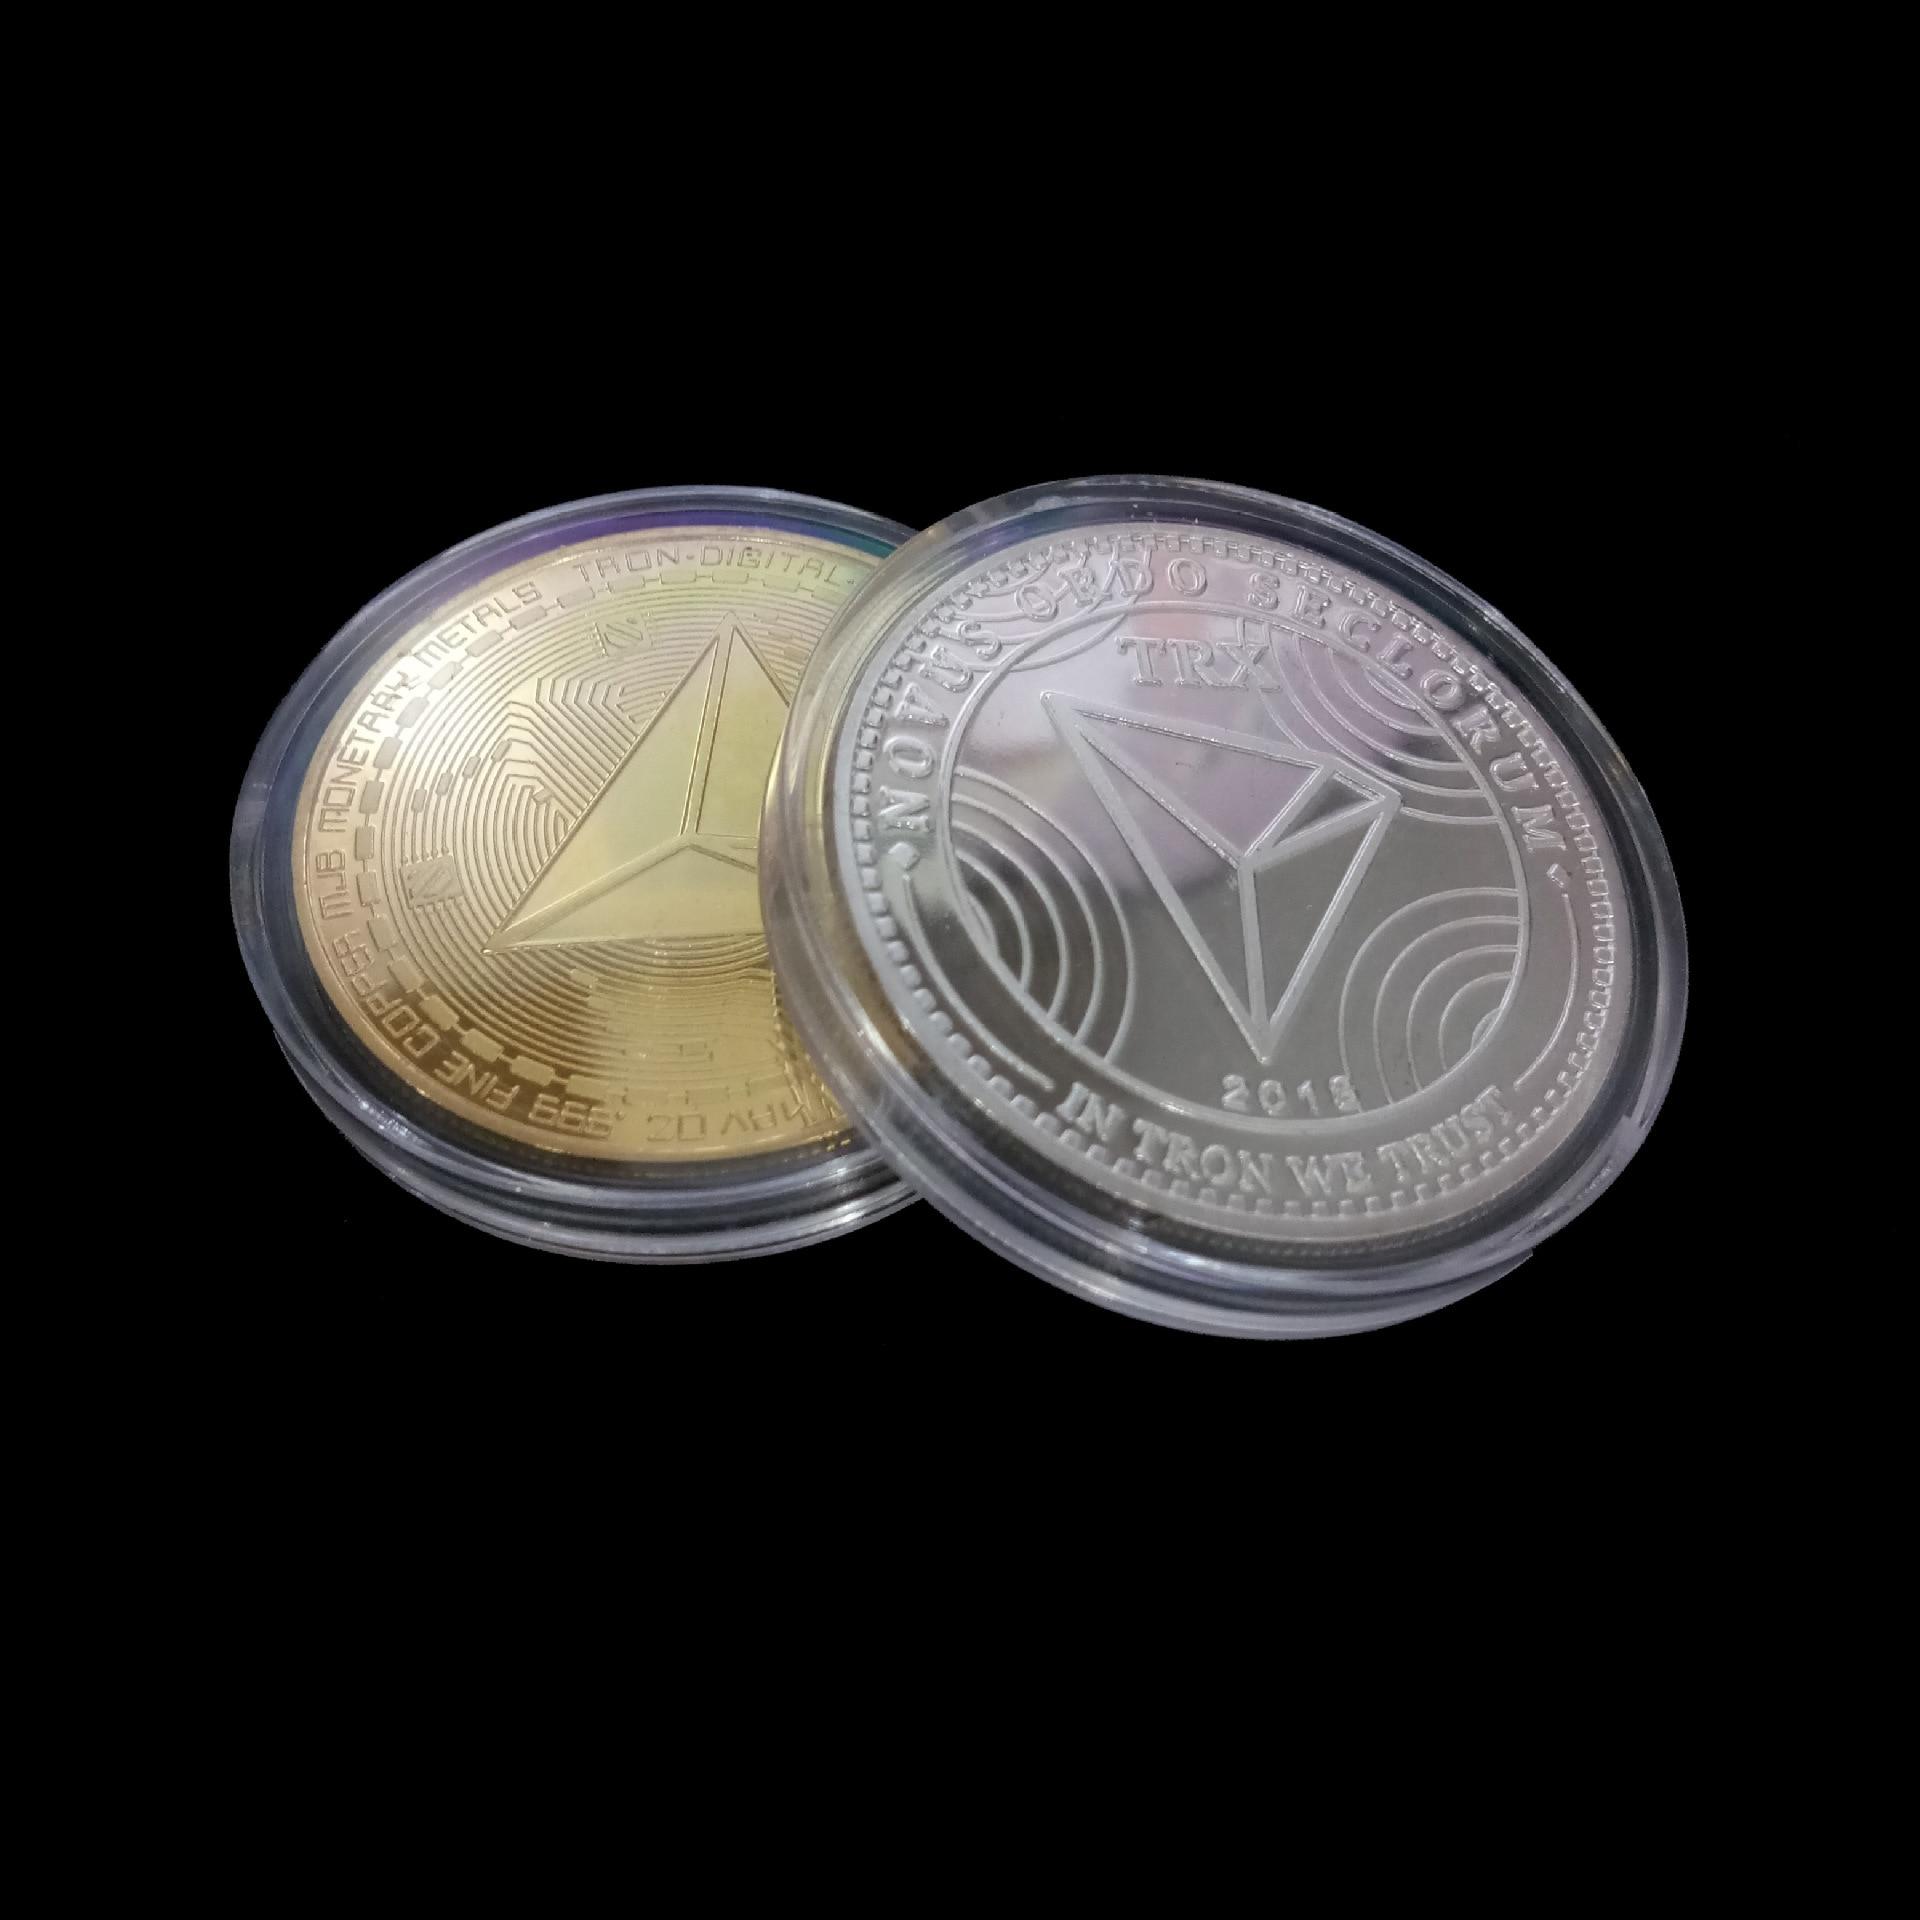 Новые неталютные TRX монеты виртуалные металлические памятные монеты TRX монеты Биткоин памятные монеты подарок Прямая